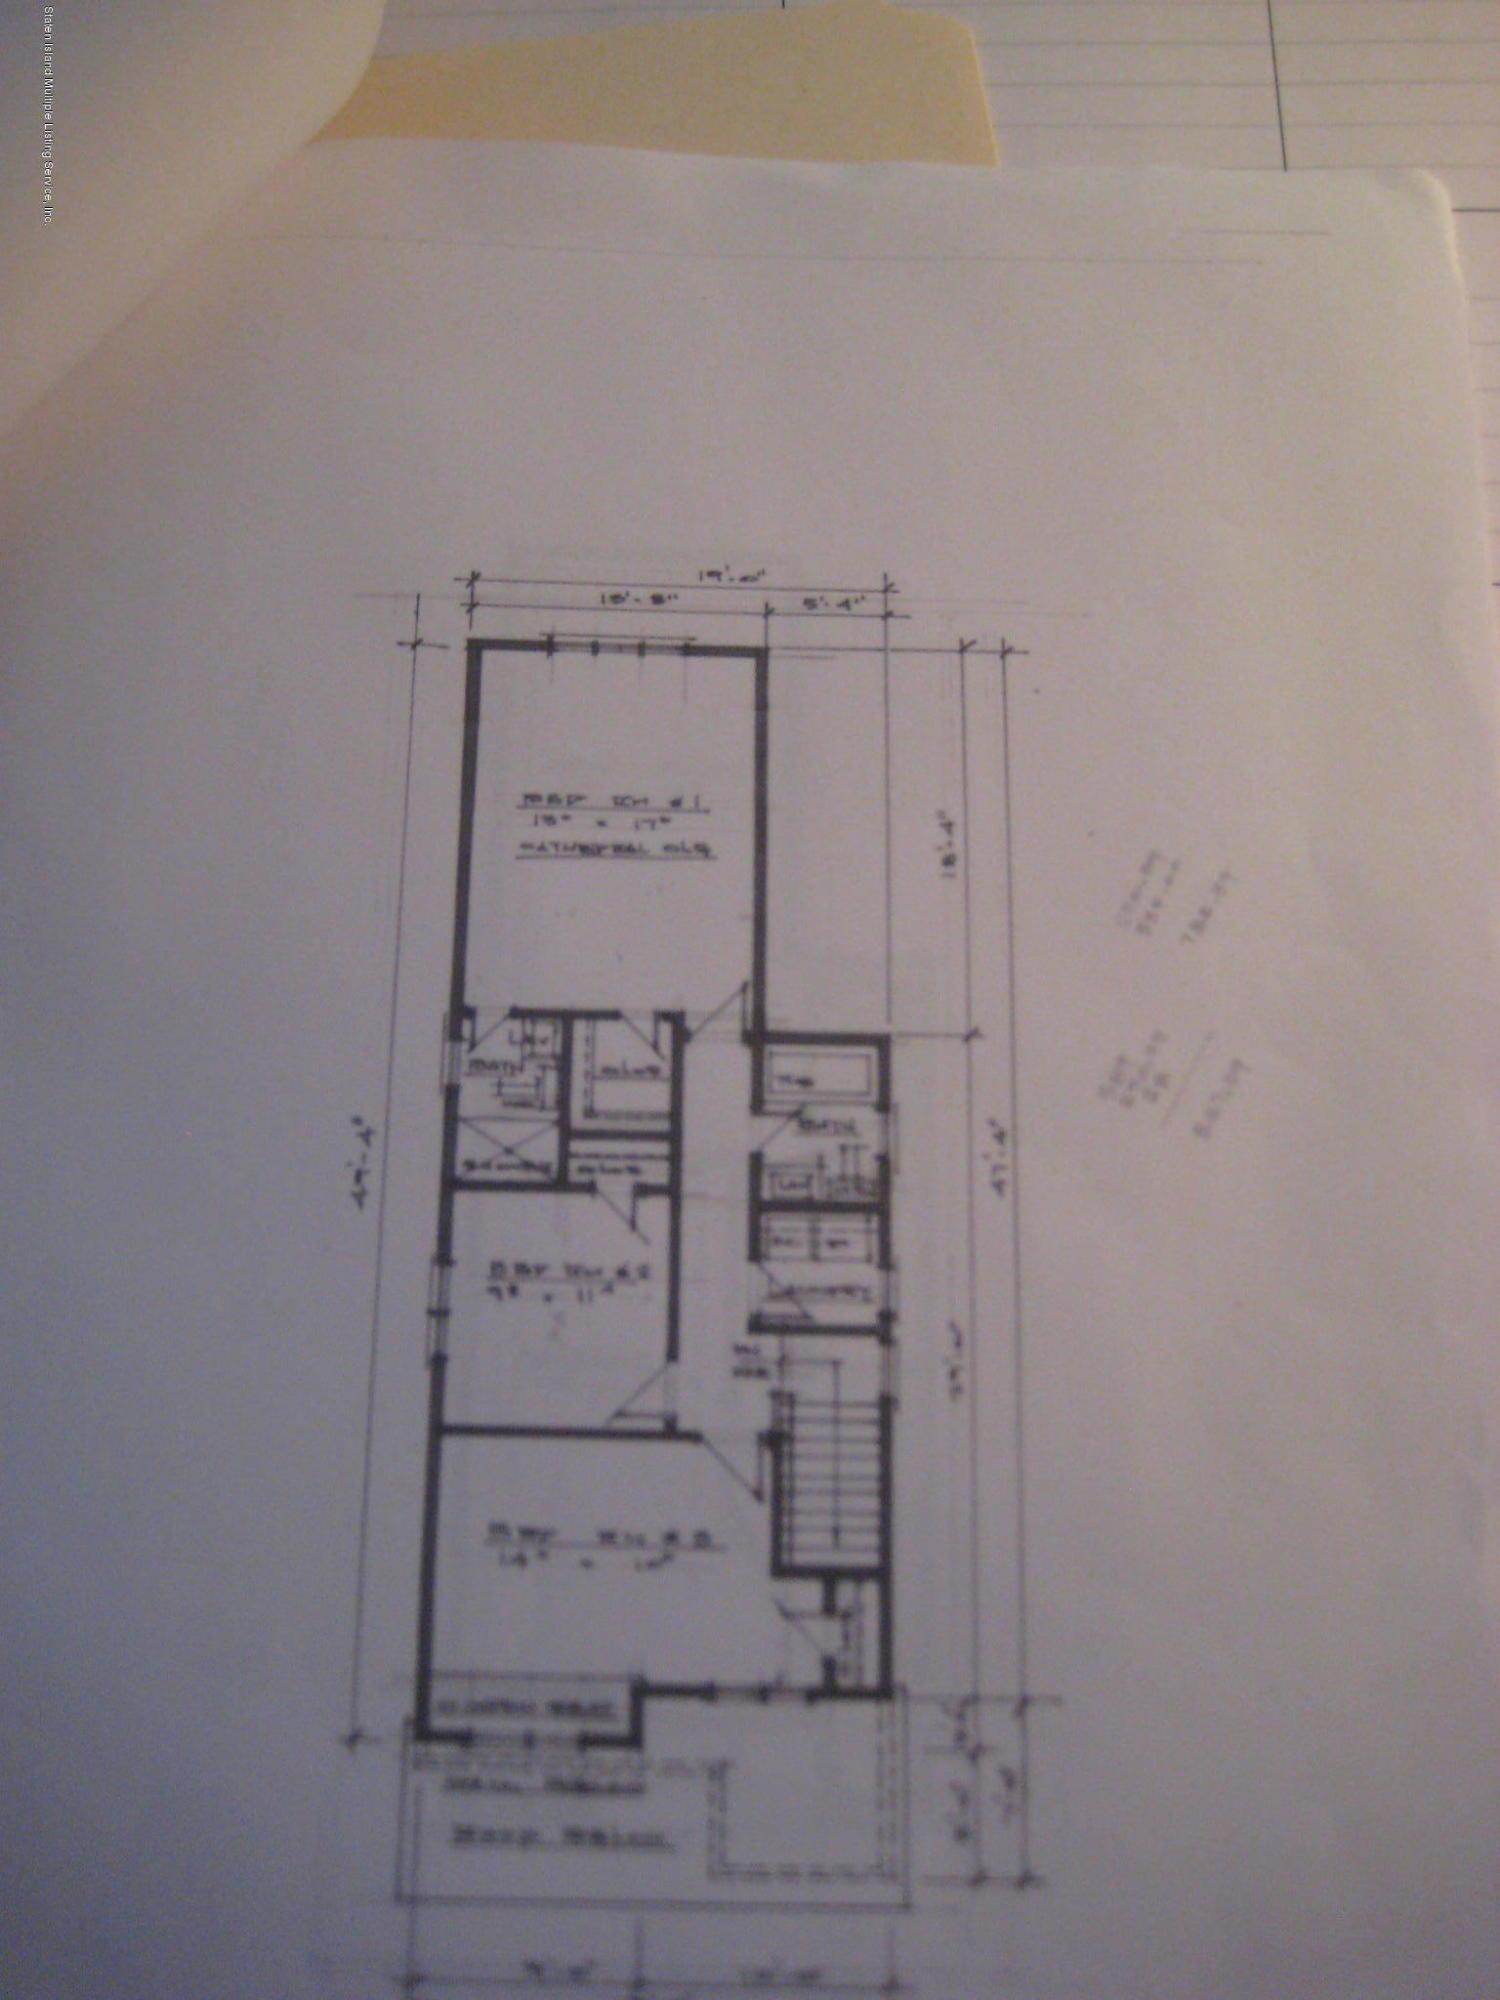 Single Family - Detached 28 Scribner Avenue  Staten Island, NY 10301, MLS-1130251-7